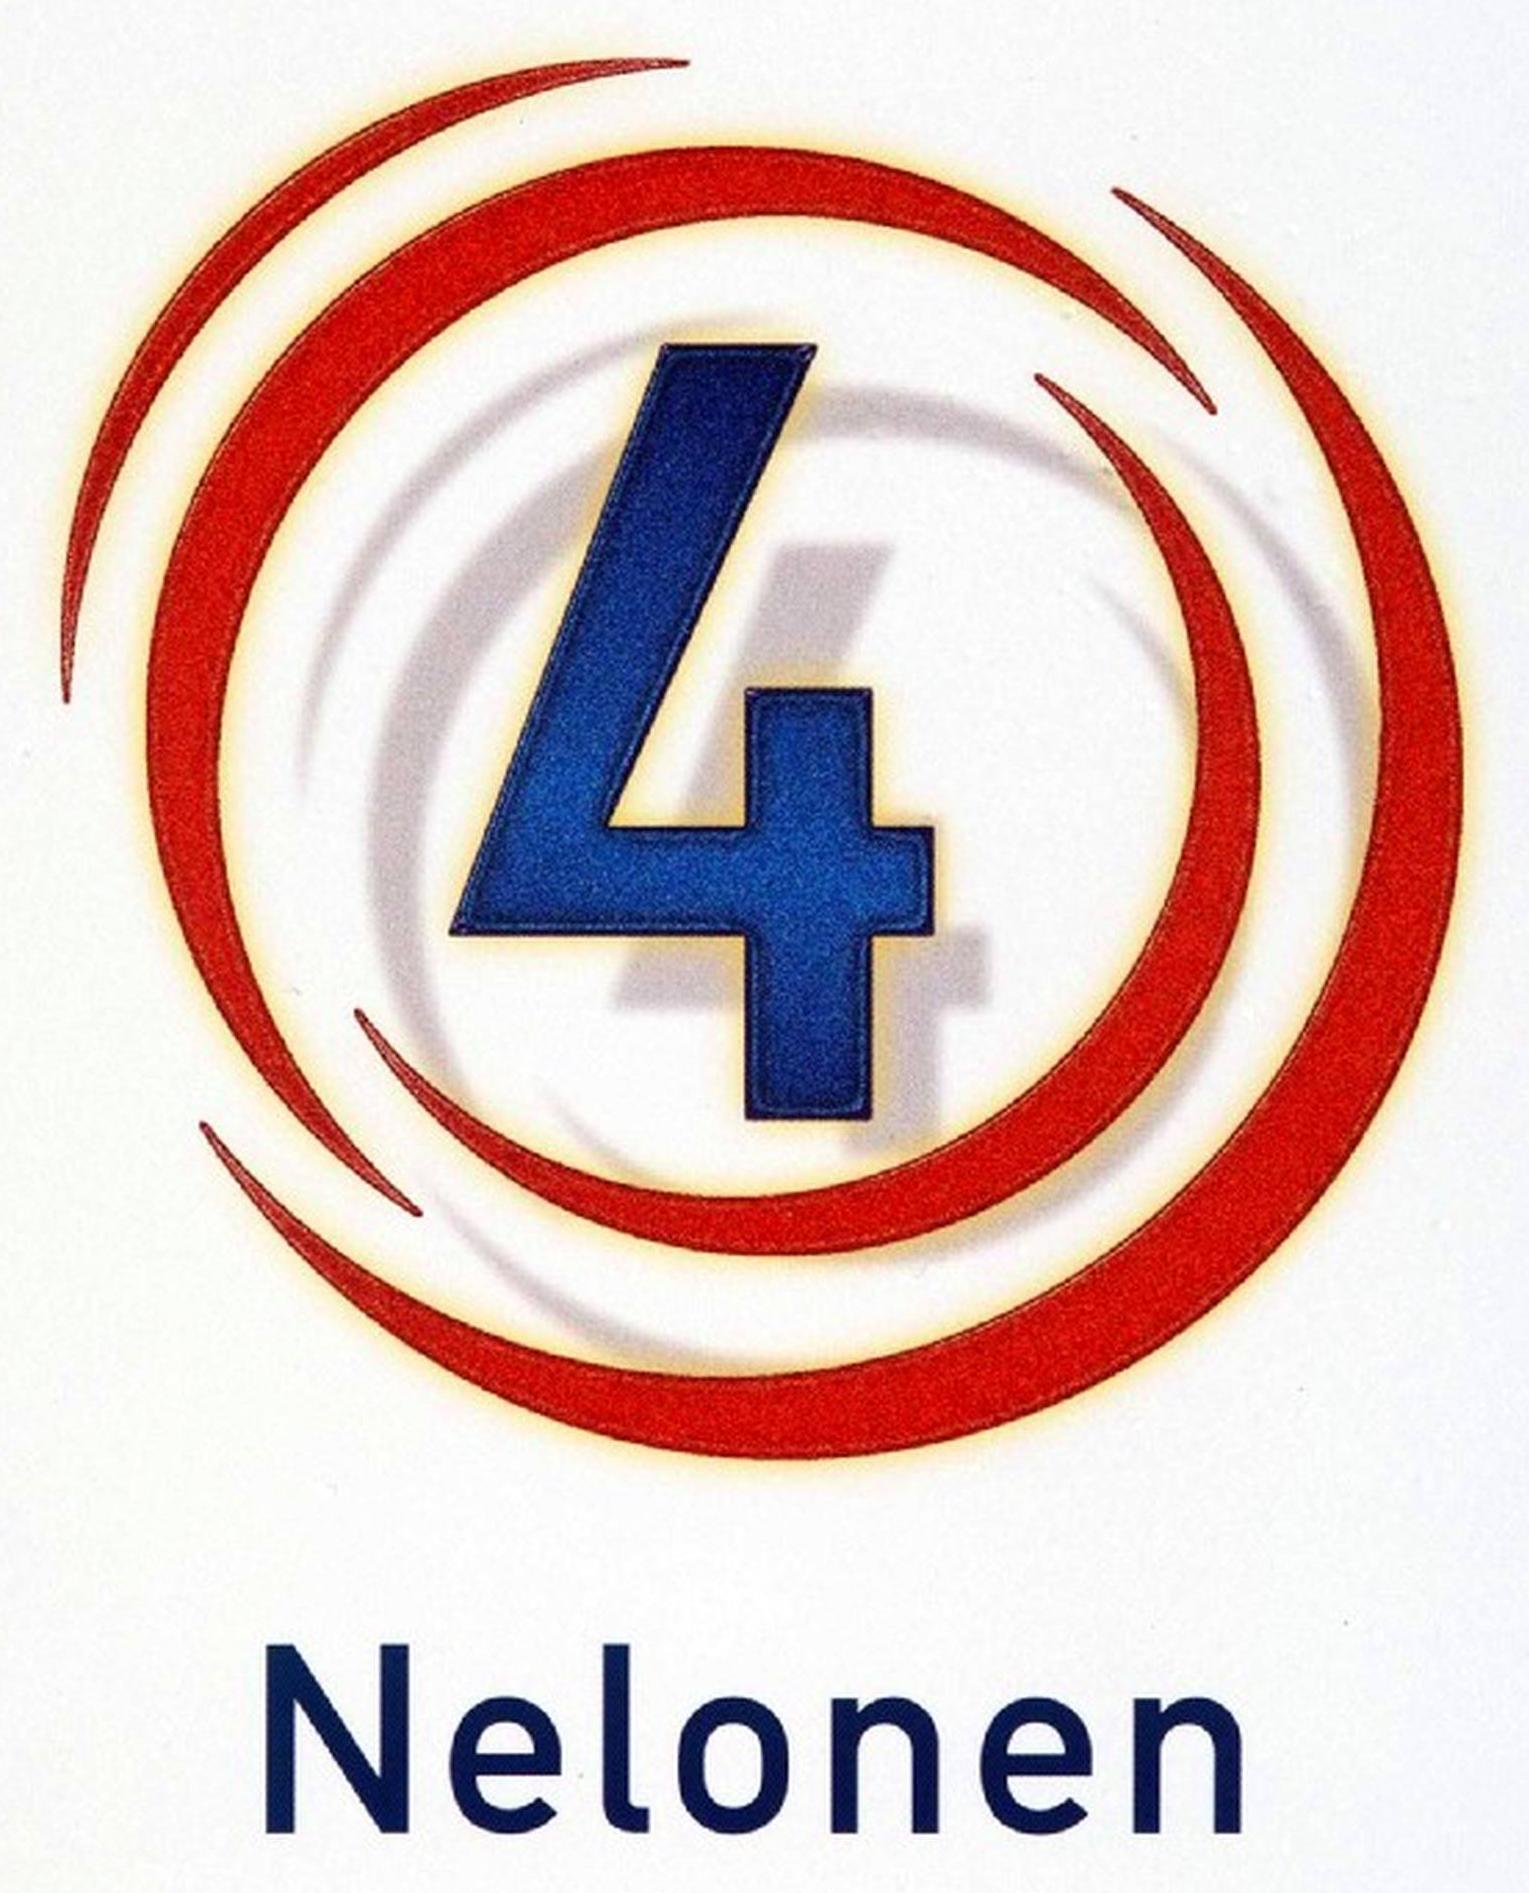 File:Nelonen logo 1997.png